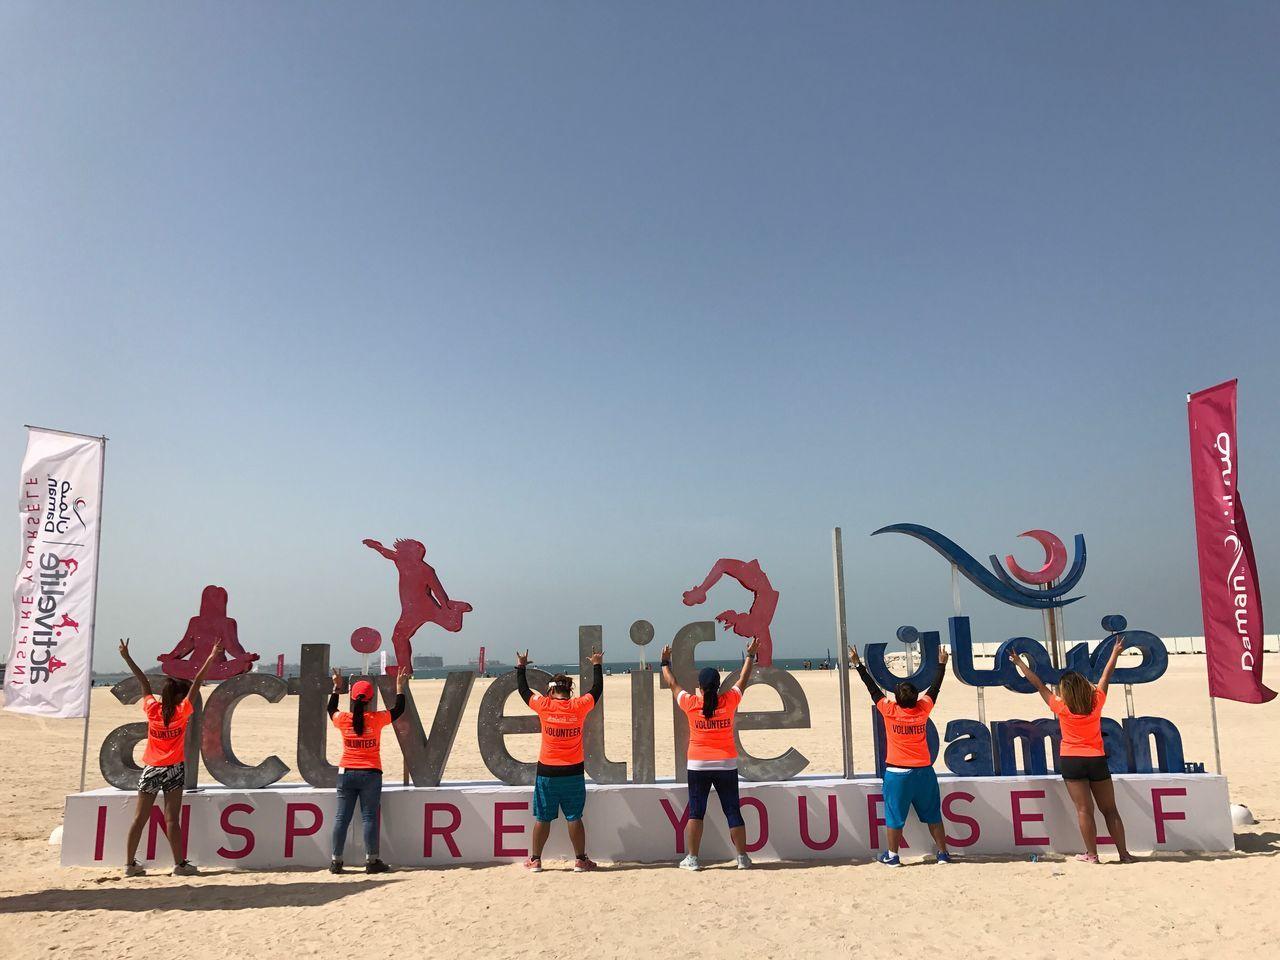 Lieblingsteil BeachRunSeries ColourfulRunners Clear Sky Dubai EyeEm Best Shots The Following Outdoors The Way Forward Orange Beach Skyline The Human Condition Summer People Active Lifestyle  Running Activelifedaman NewBalance